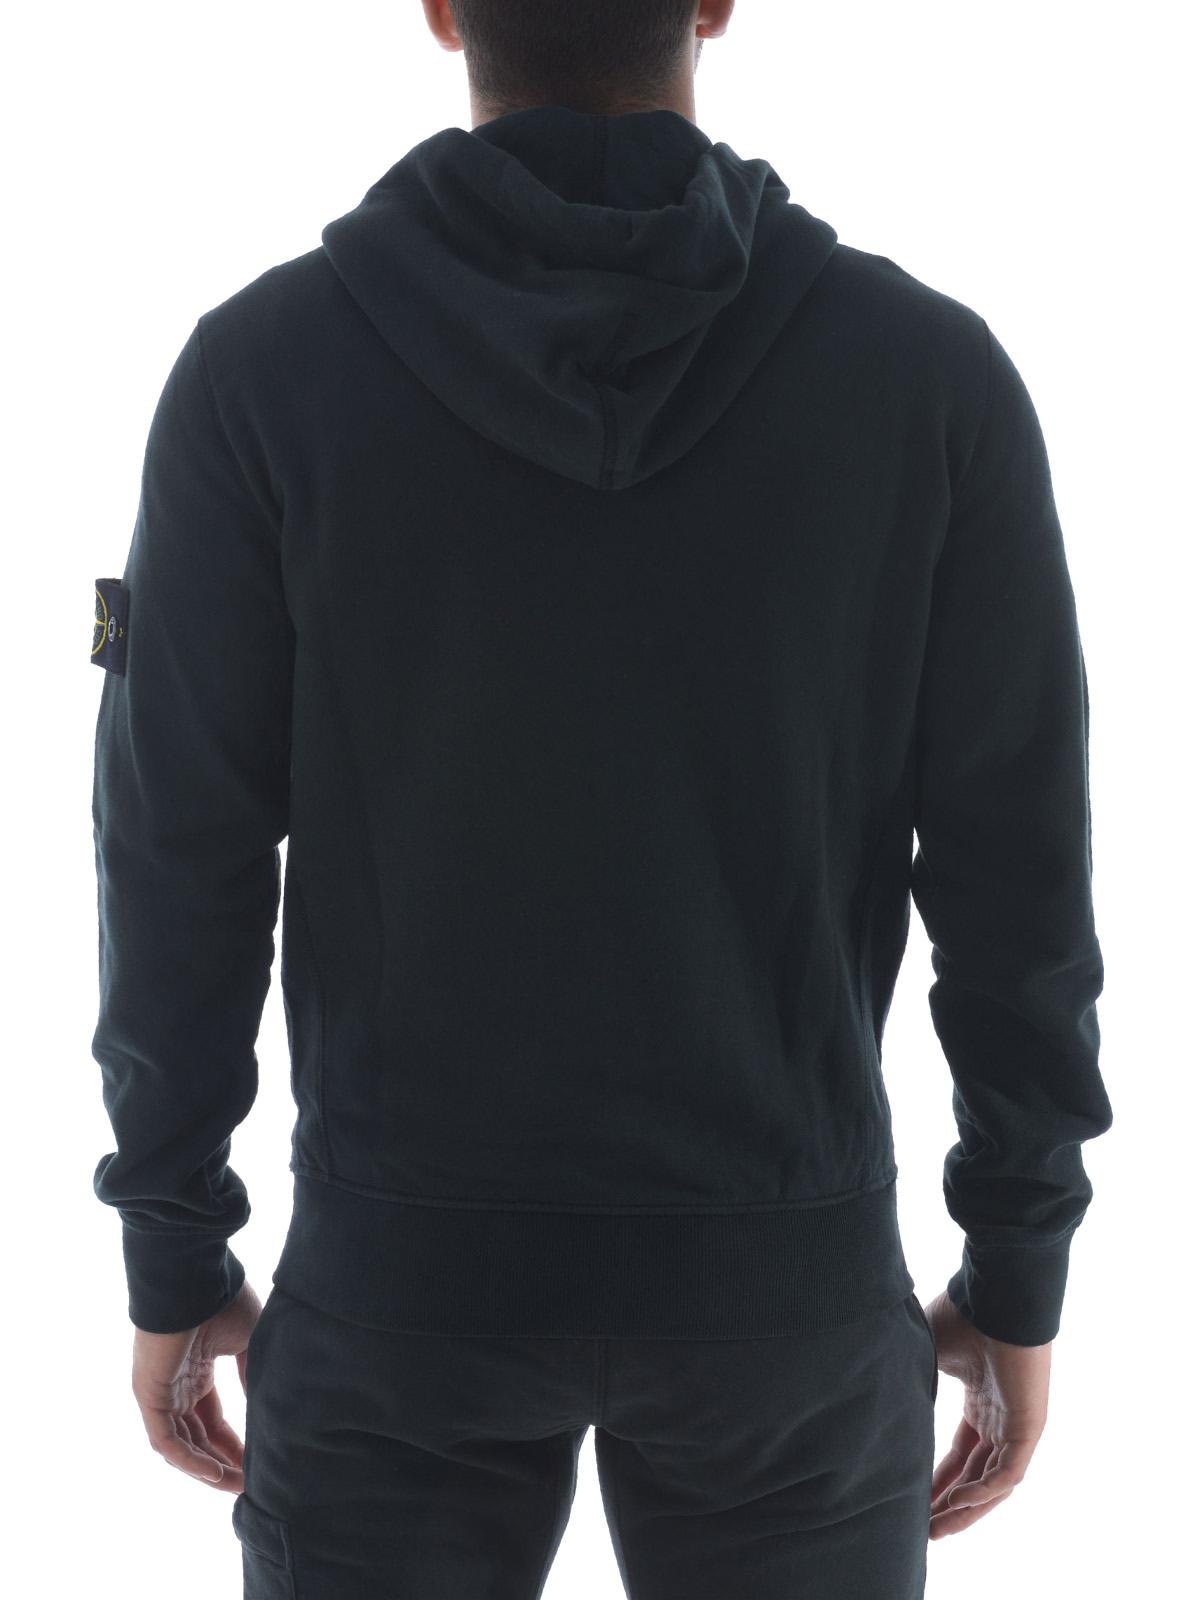 Stone island black hooded jumper dress